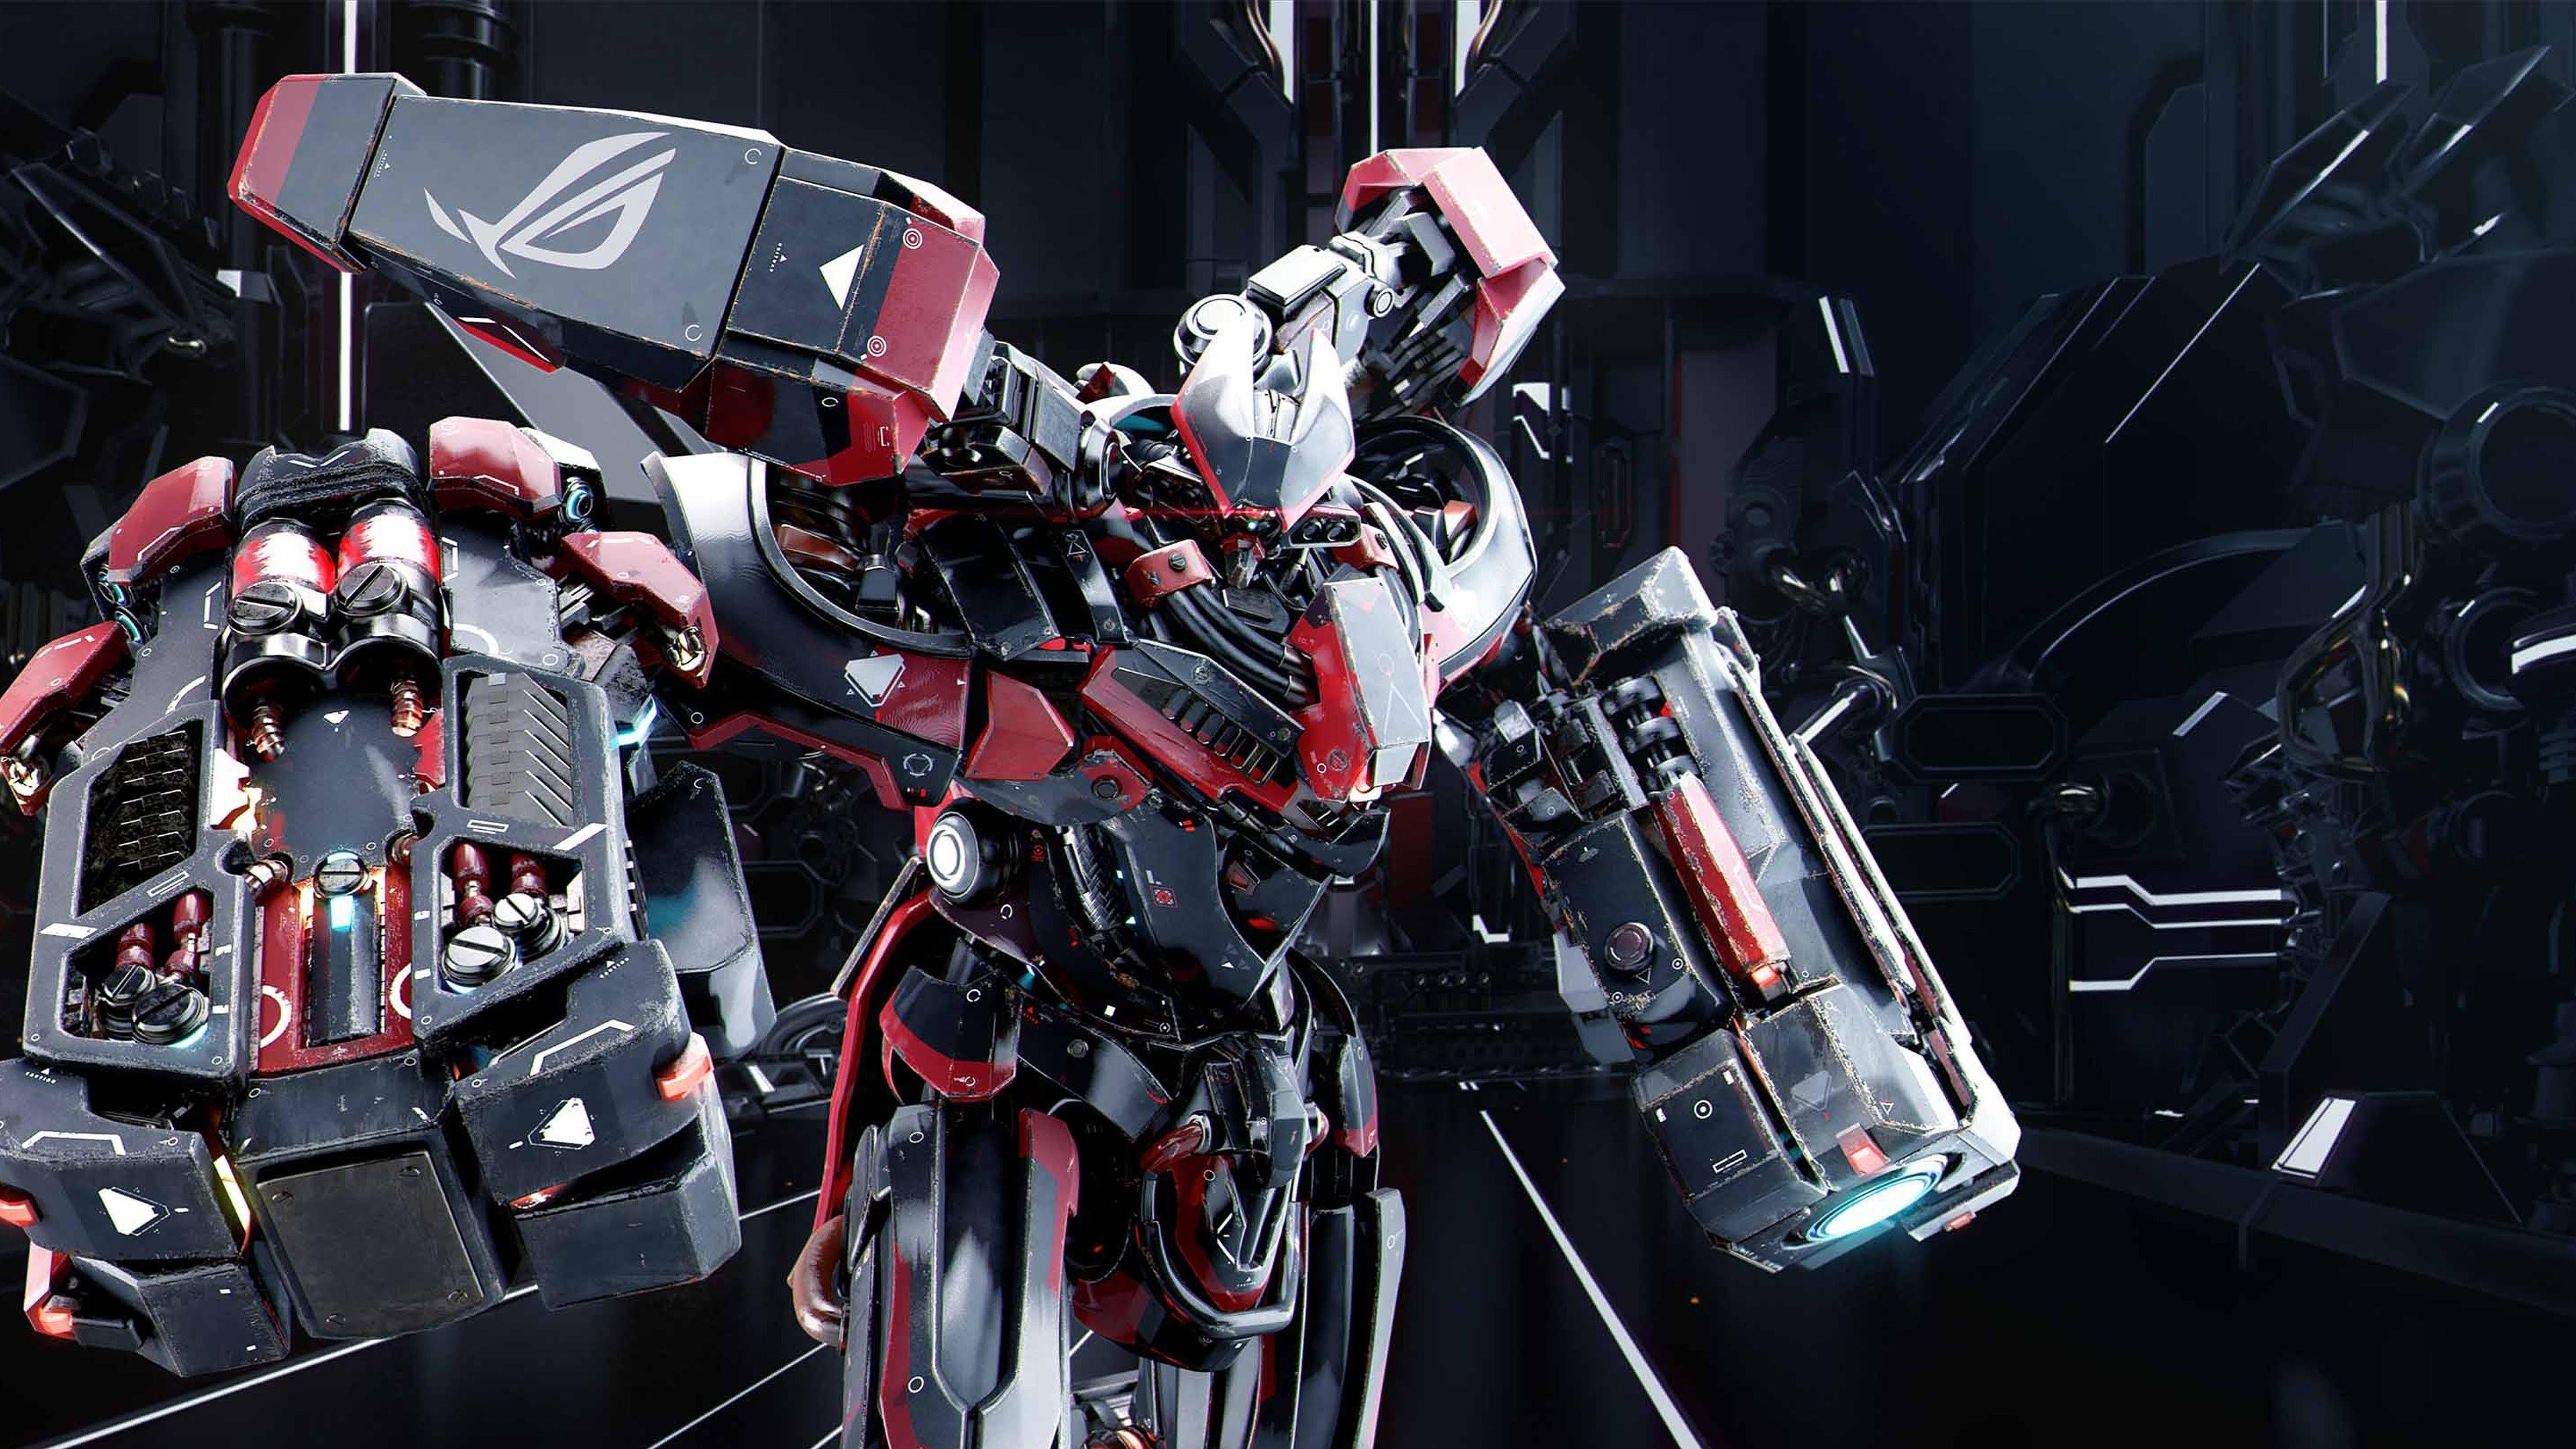 4K HD Wallpaper: Asus ROG Robot Mecha 2013